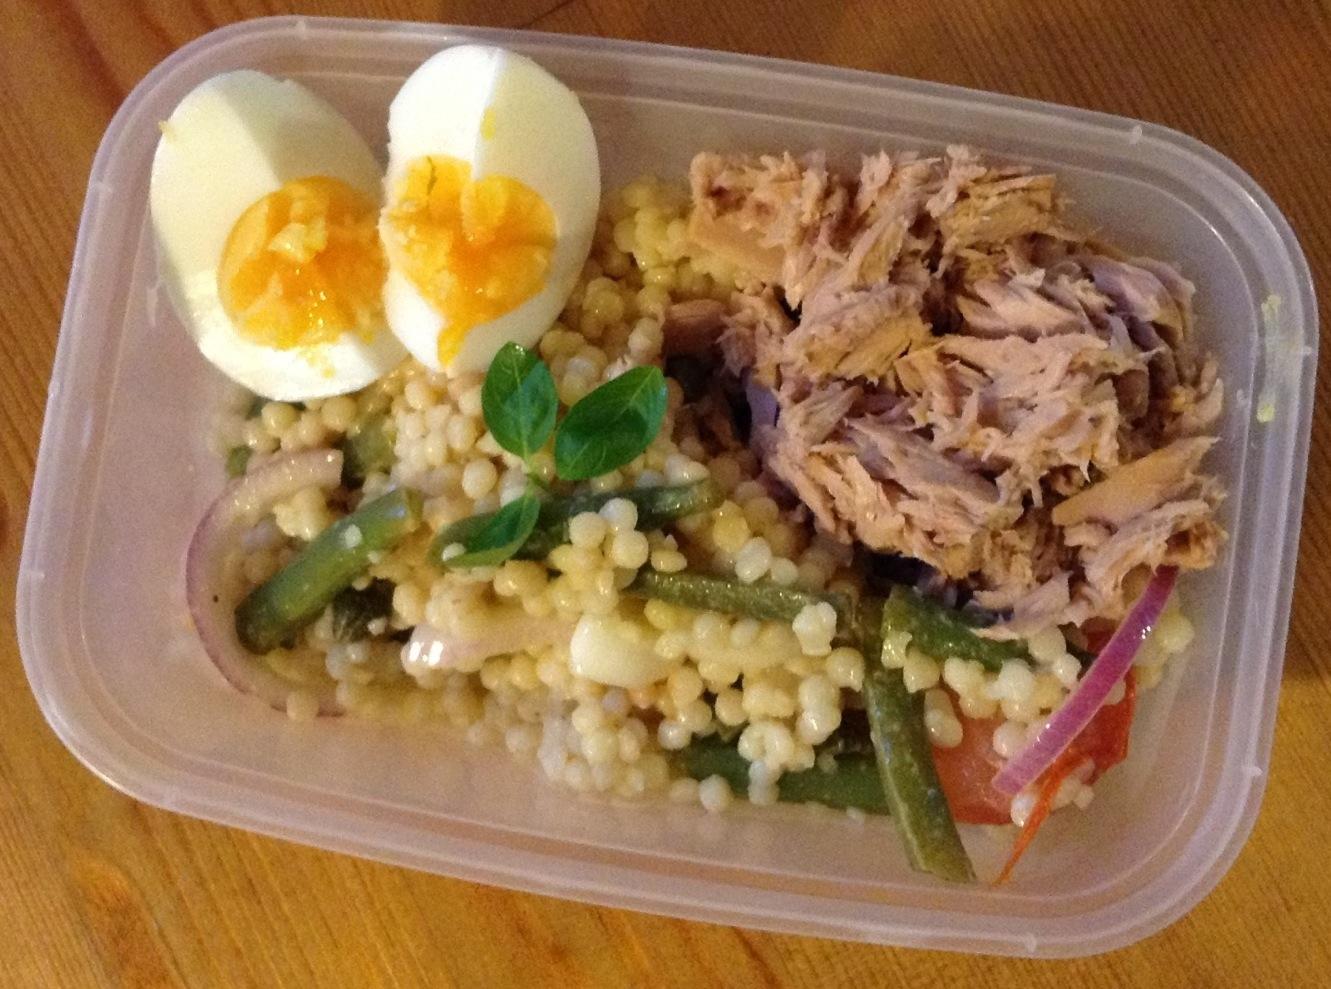 how to prepare canned tuna with mayo